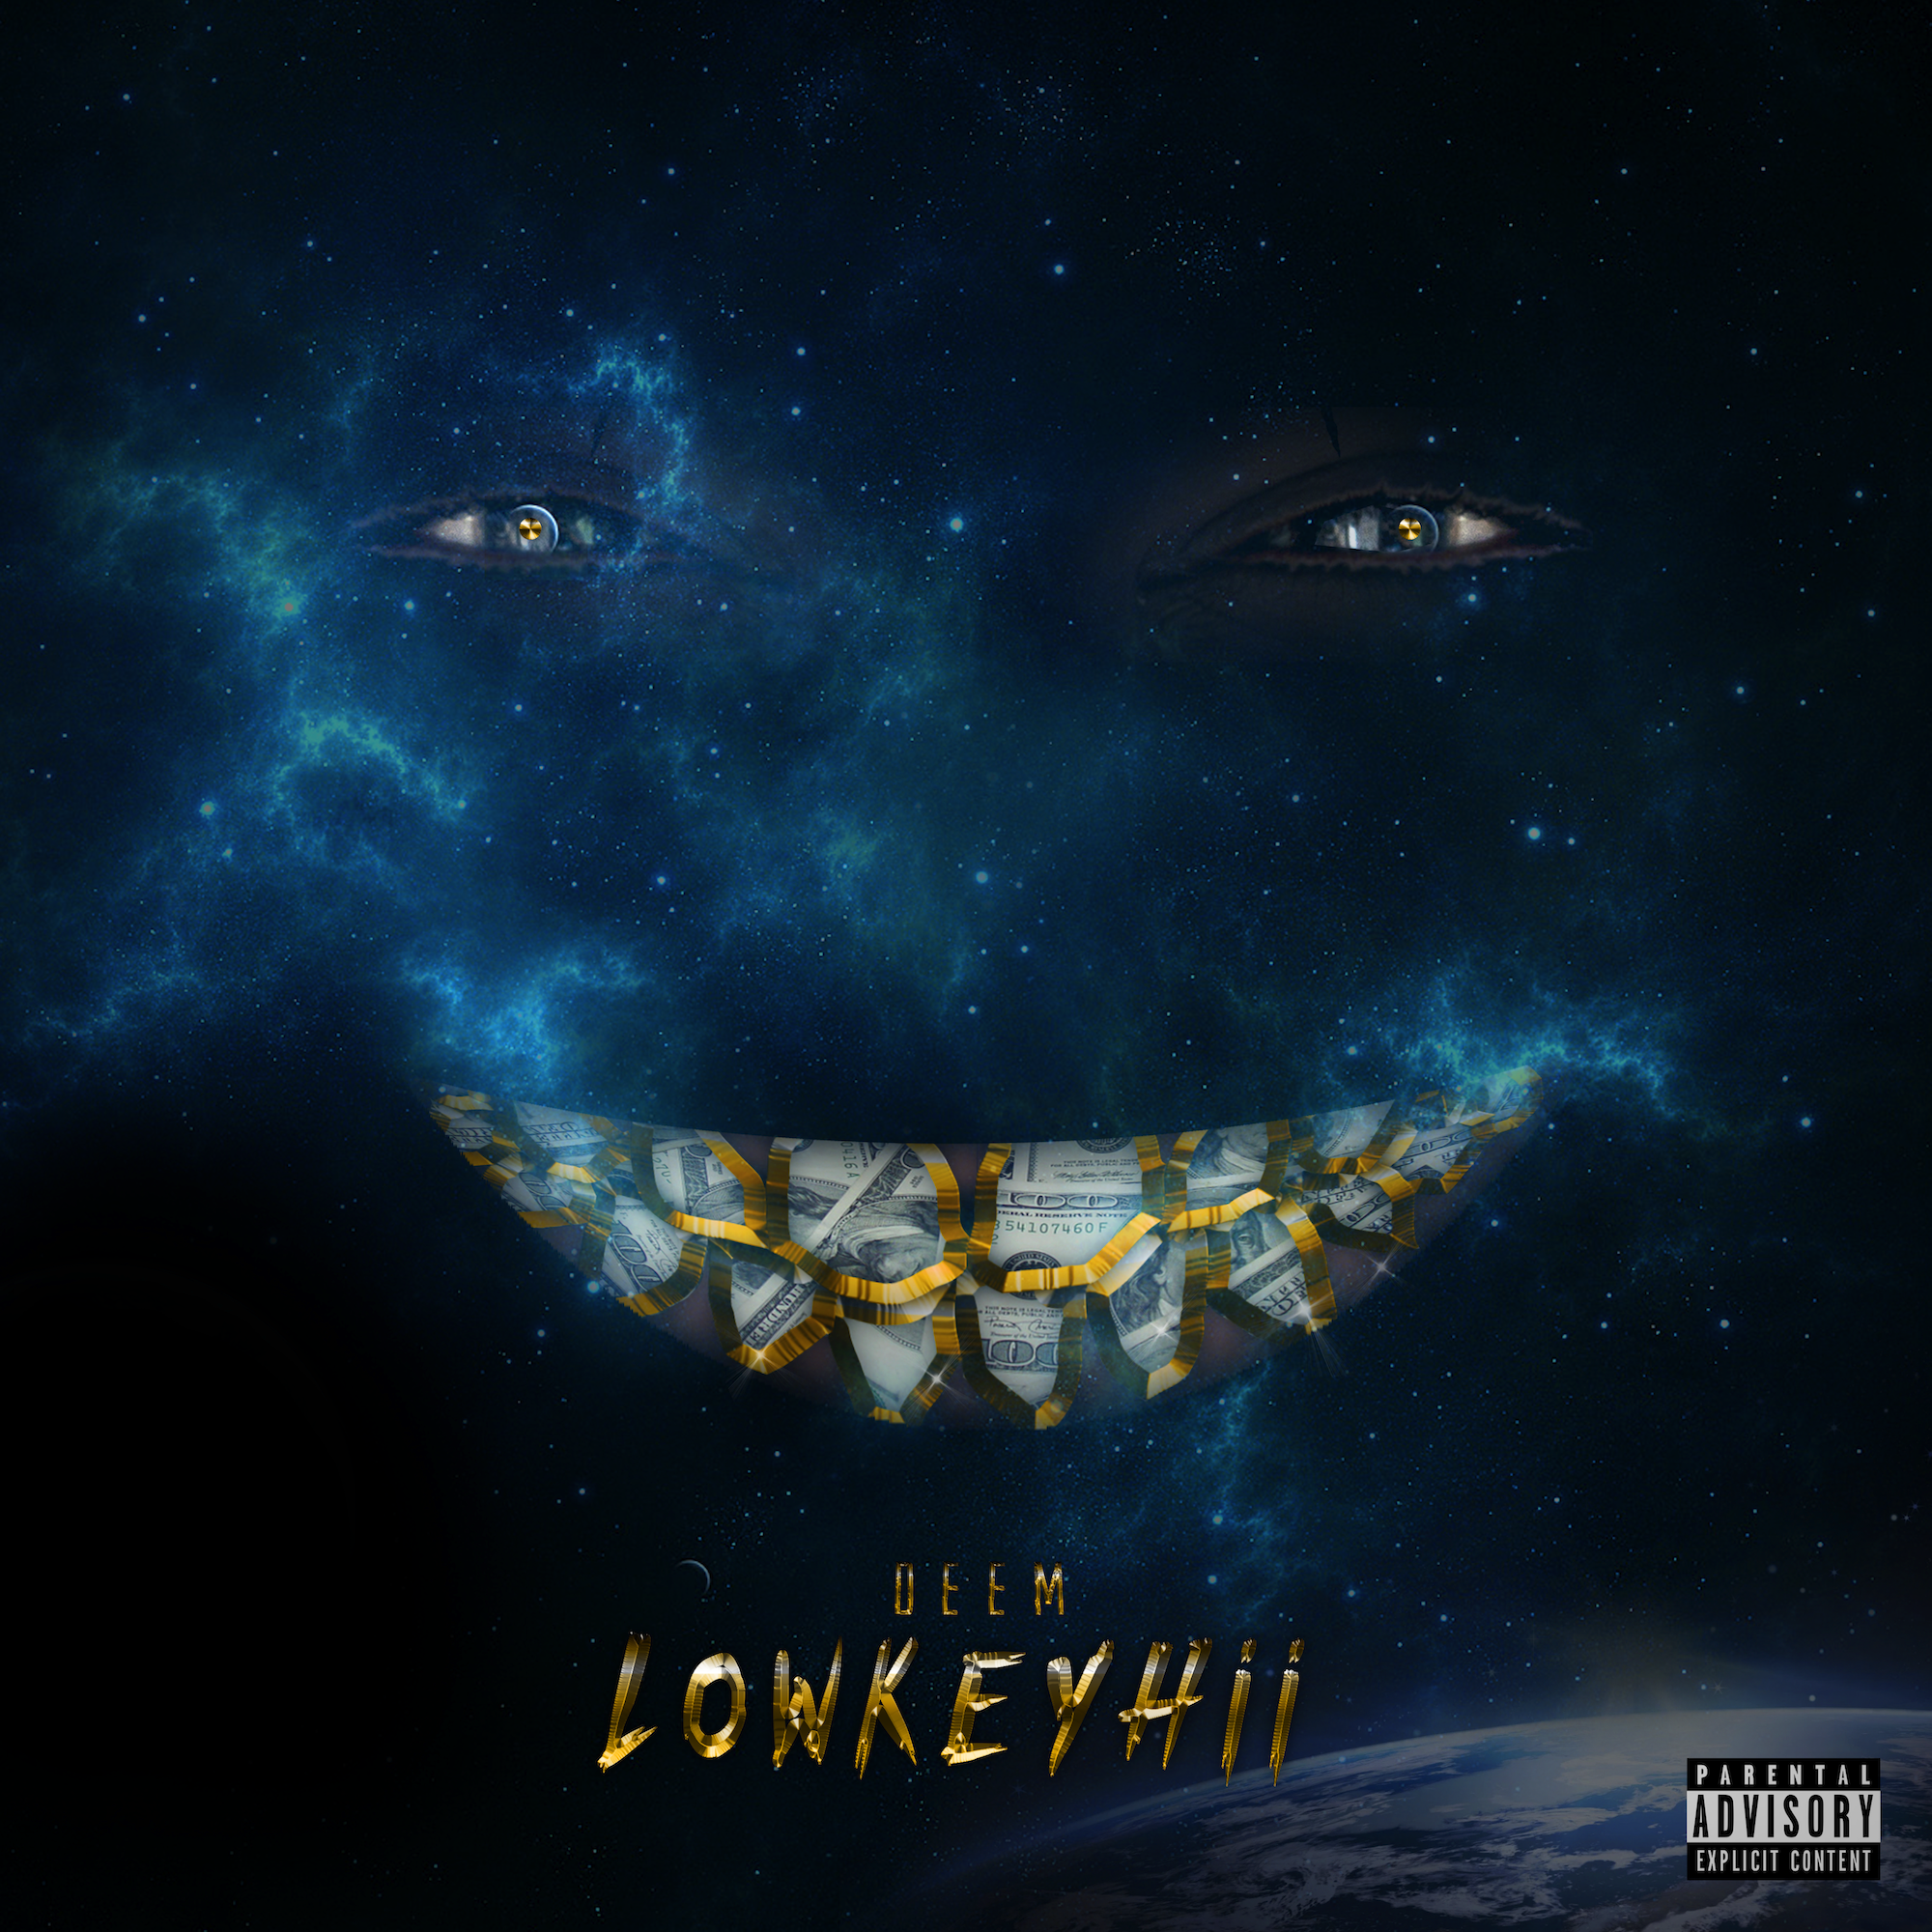 LoKeyHii LP